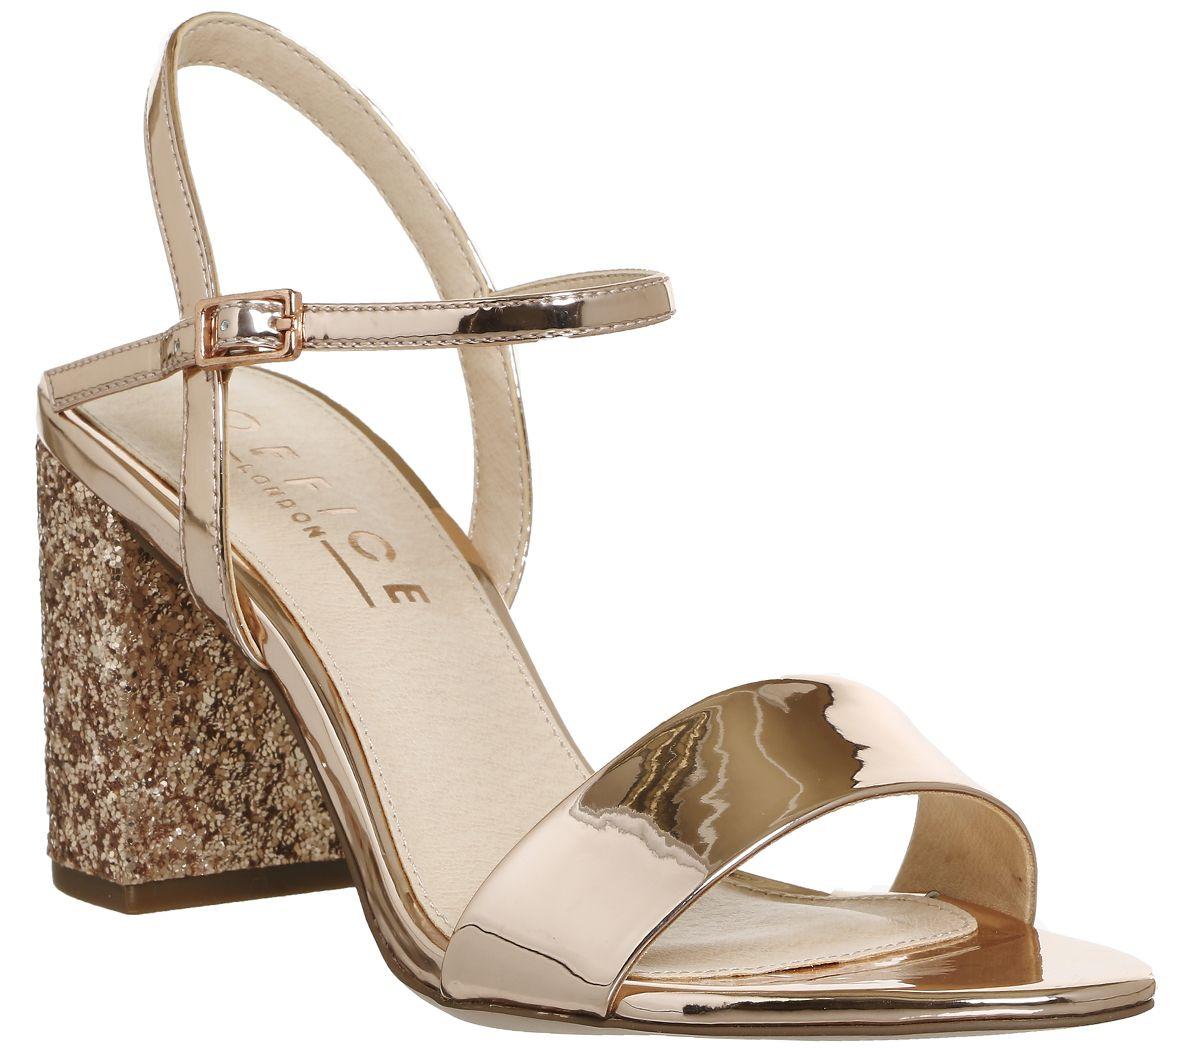 d8d72f25a24b Office Millionaire Block Heel Sandals Rose Gold Mirror - Mid Heels